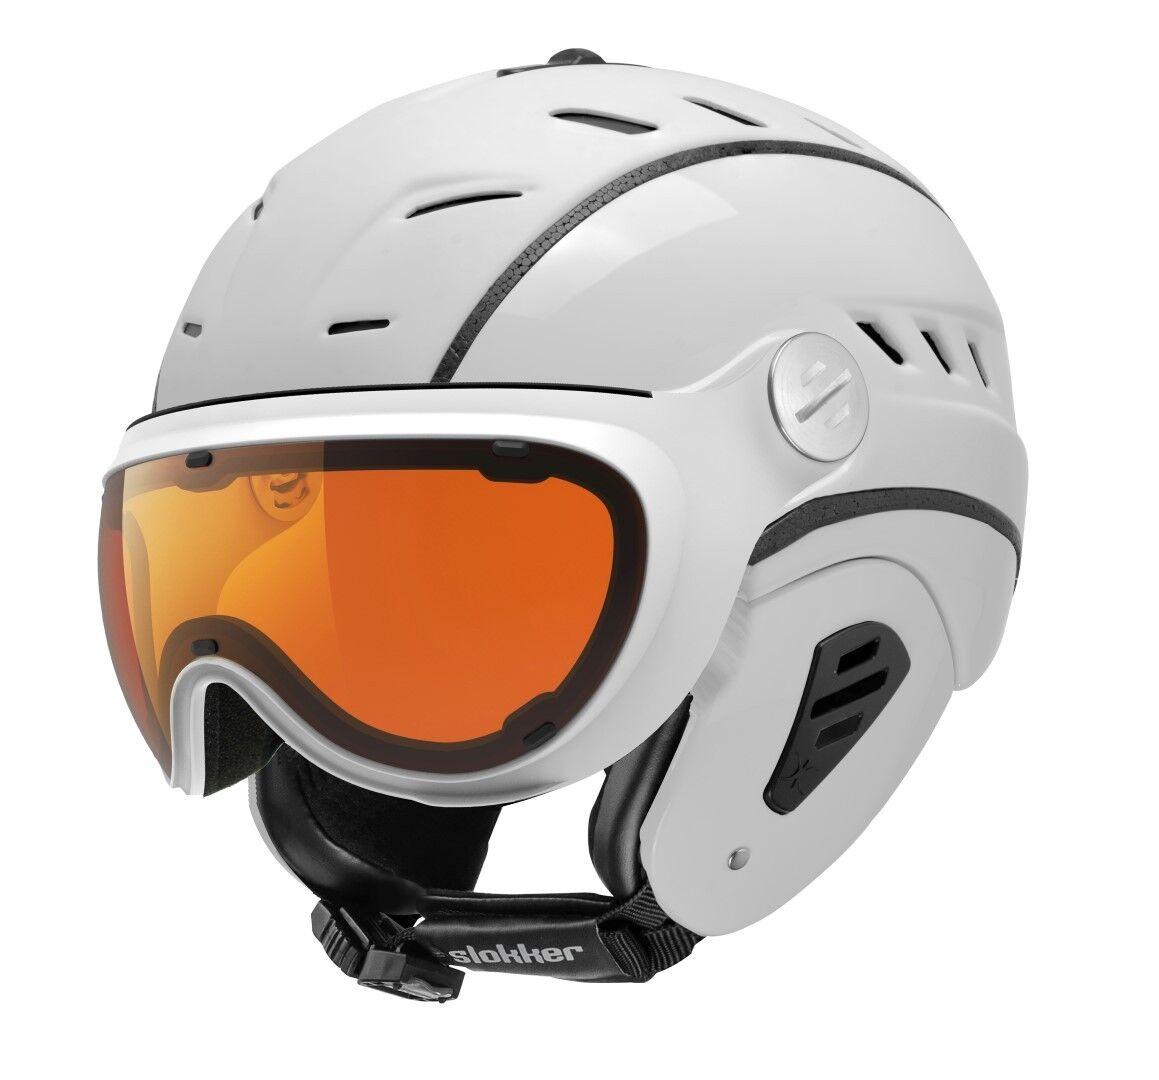 Slokker BAKKA Weiß Visier Skihelm Snowboardhelm Helm optimal für Brillenträger